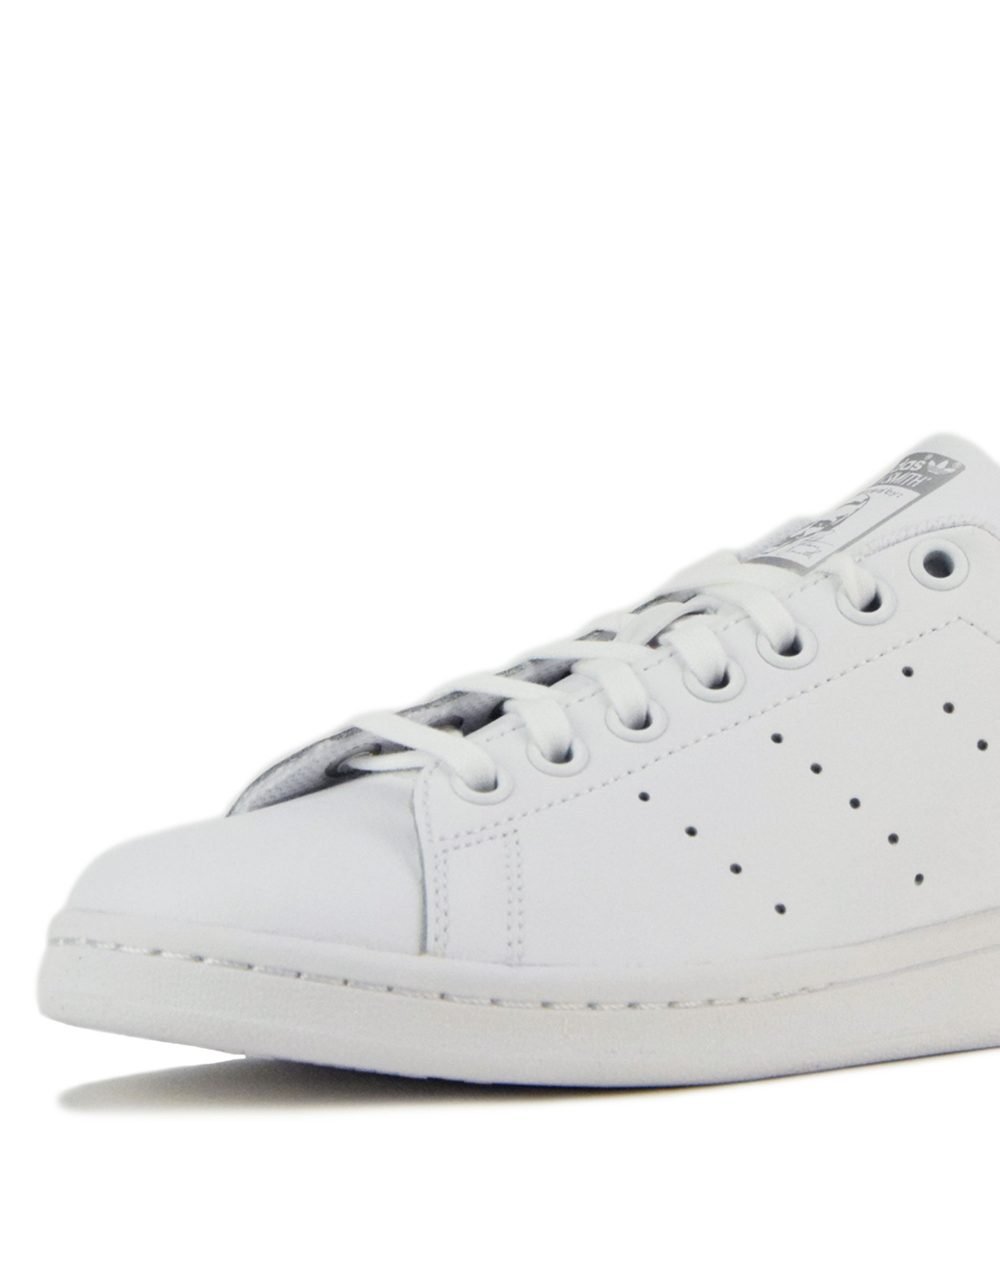 Adidas Stan Smith Junior (EE8483) White/Silver